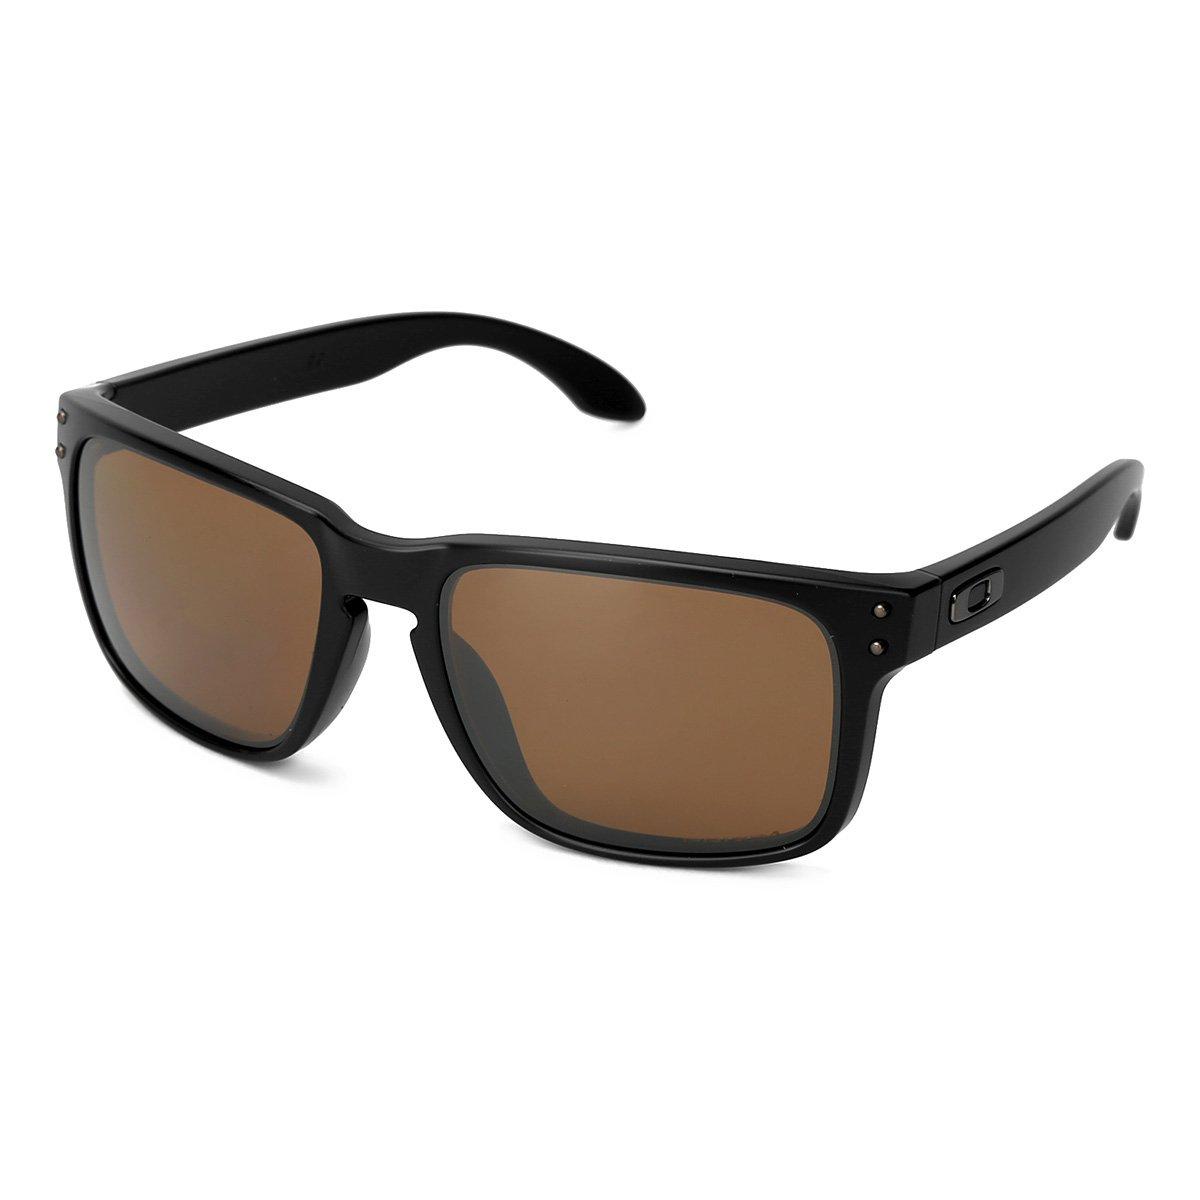 6651602186684 Óculos de Sol Oakley Holbrook Masculino - Marrom e Preto - Compre ...